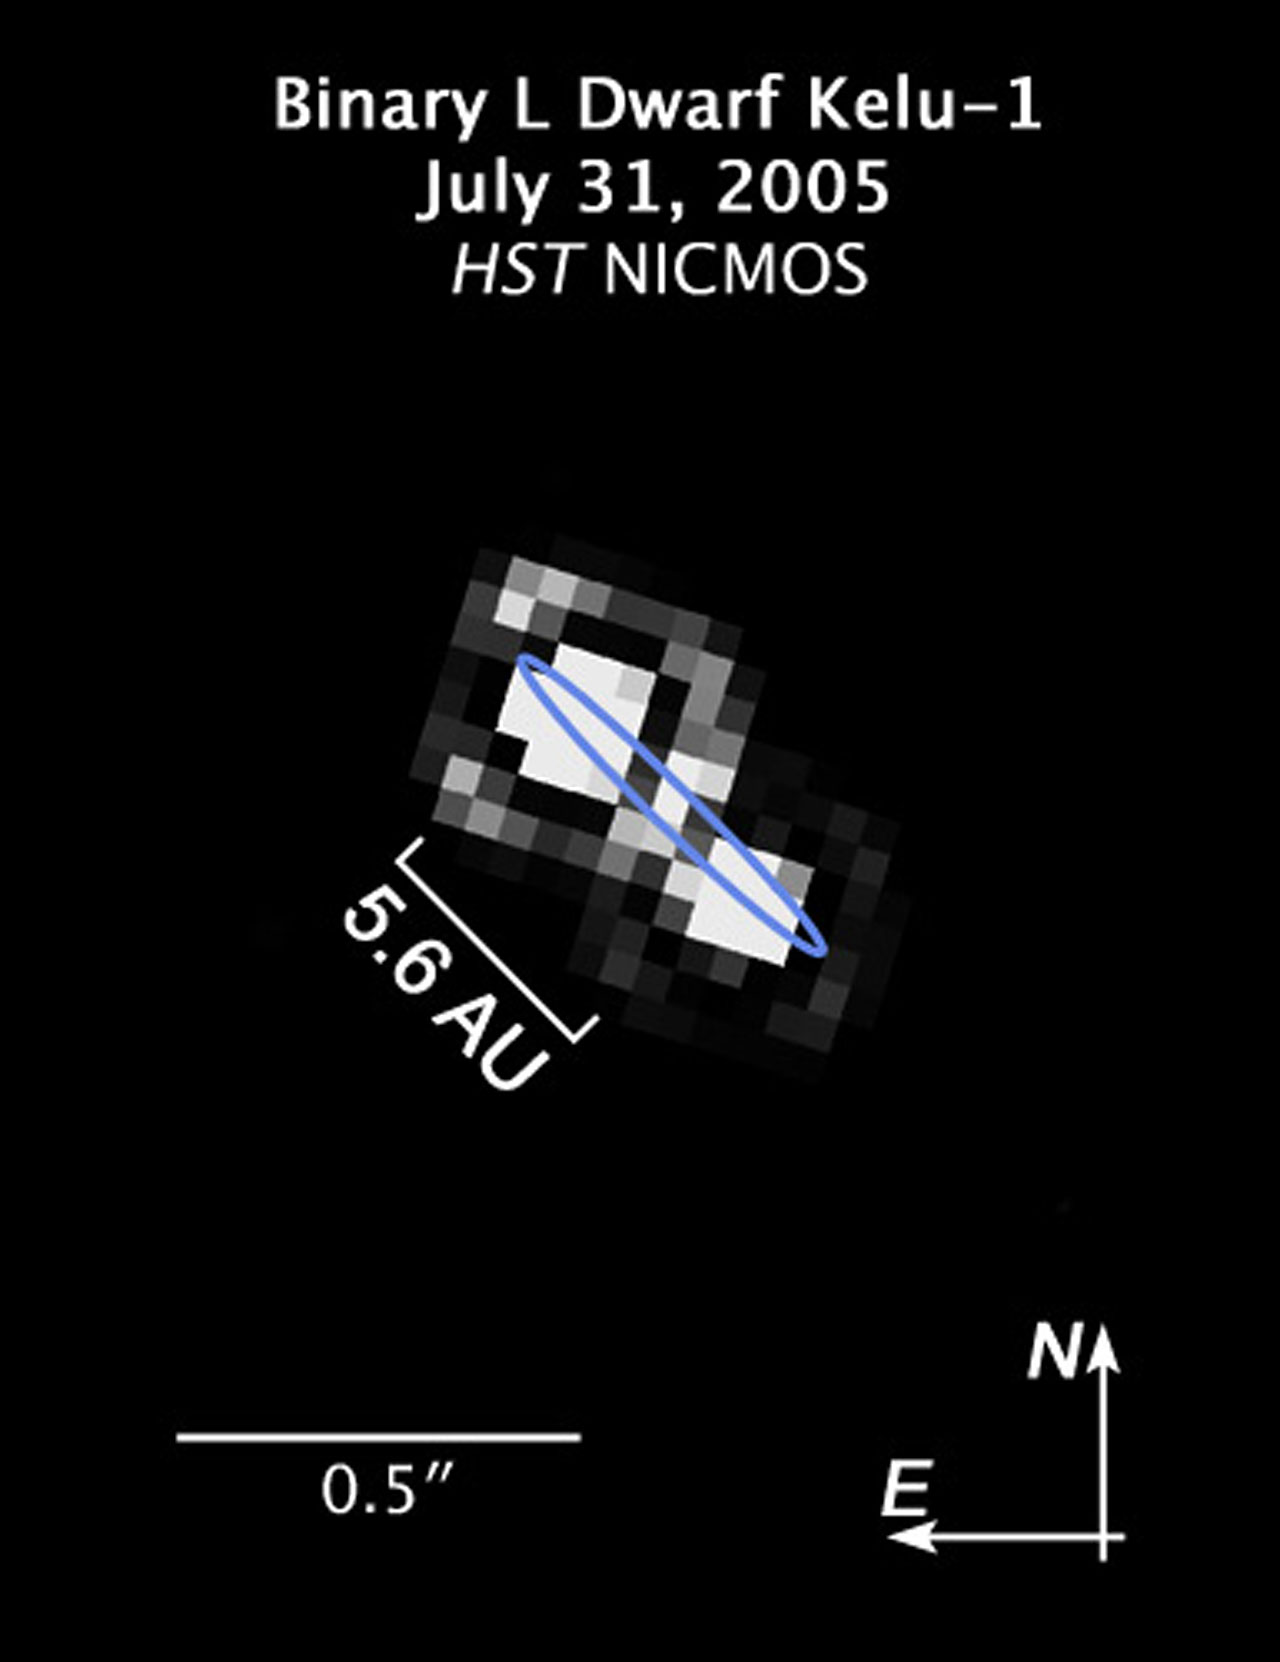 Compass and scale image of binary L dwarf Kelu-1